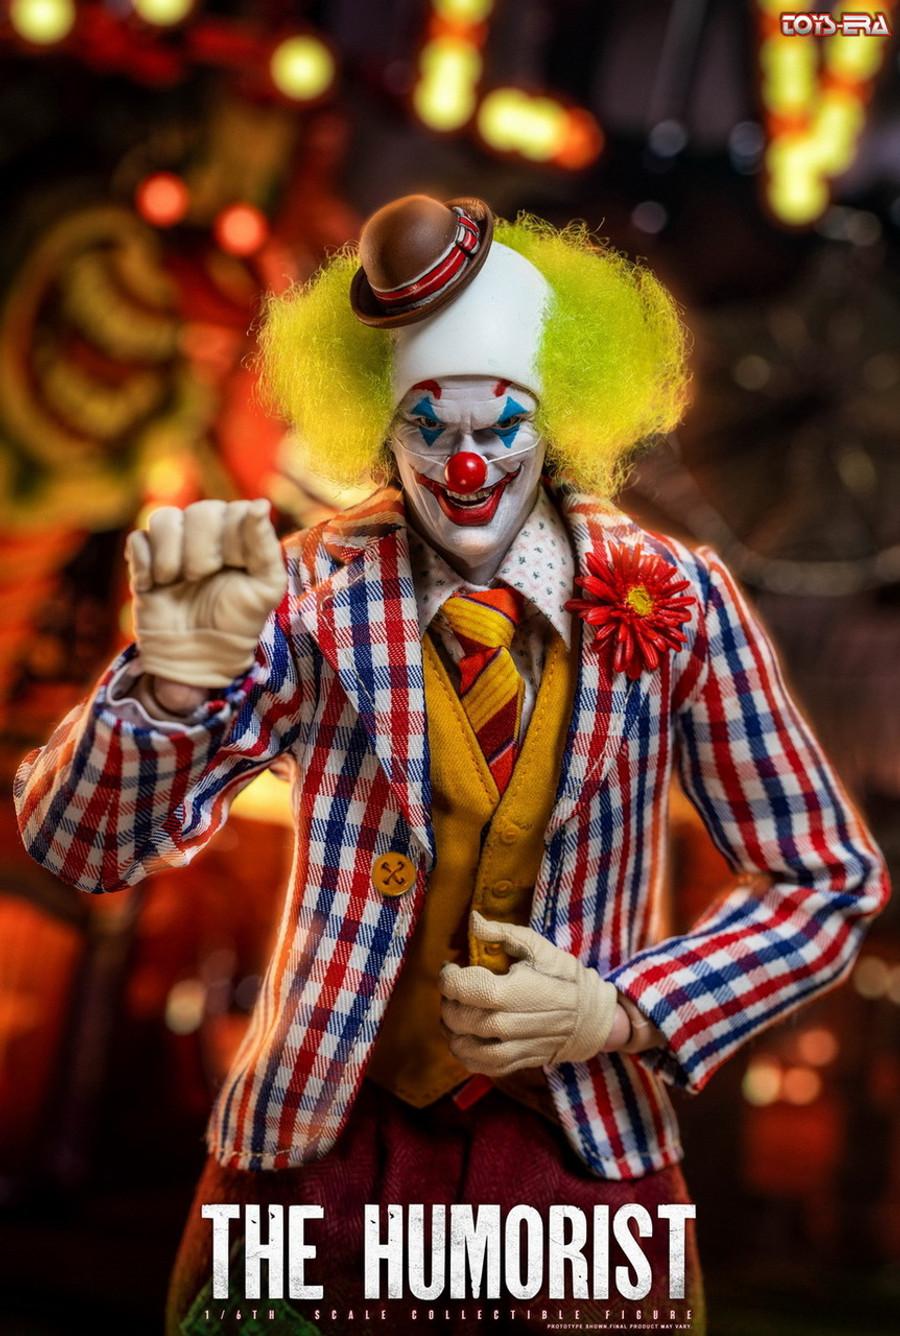 Toys Era - The Humorist